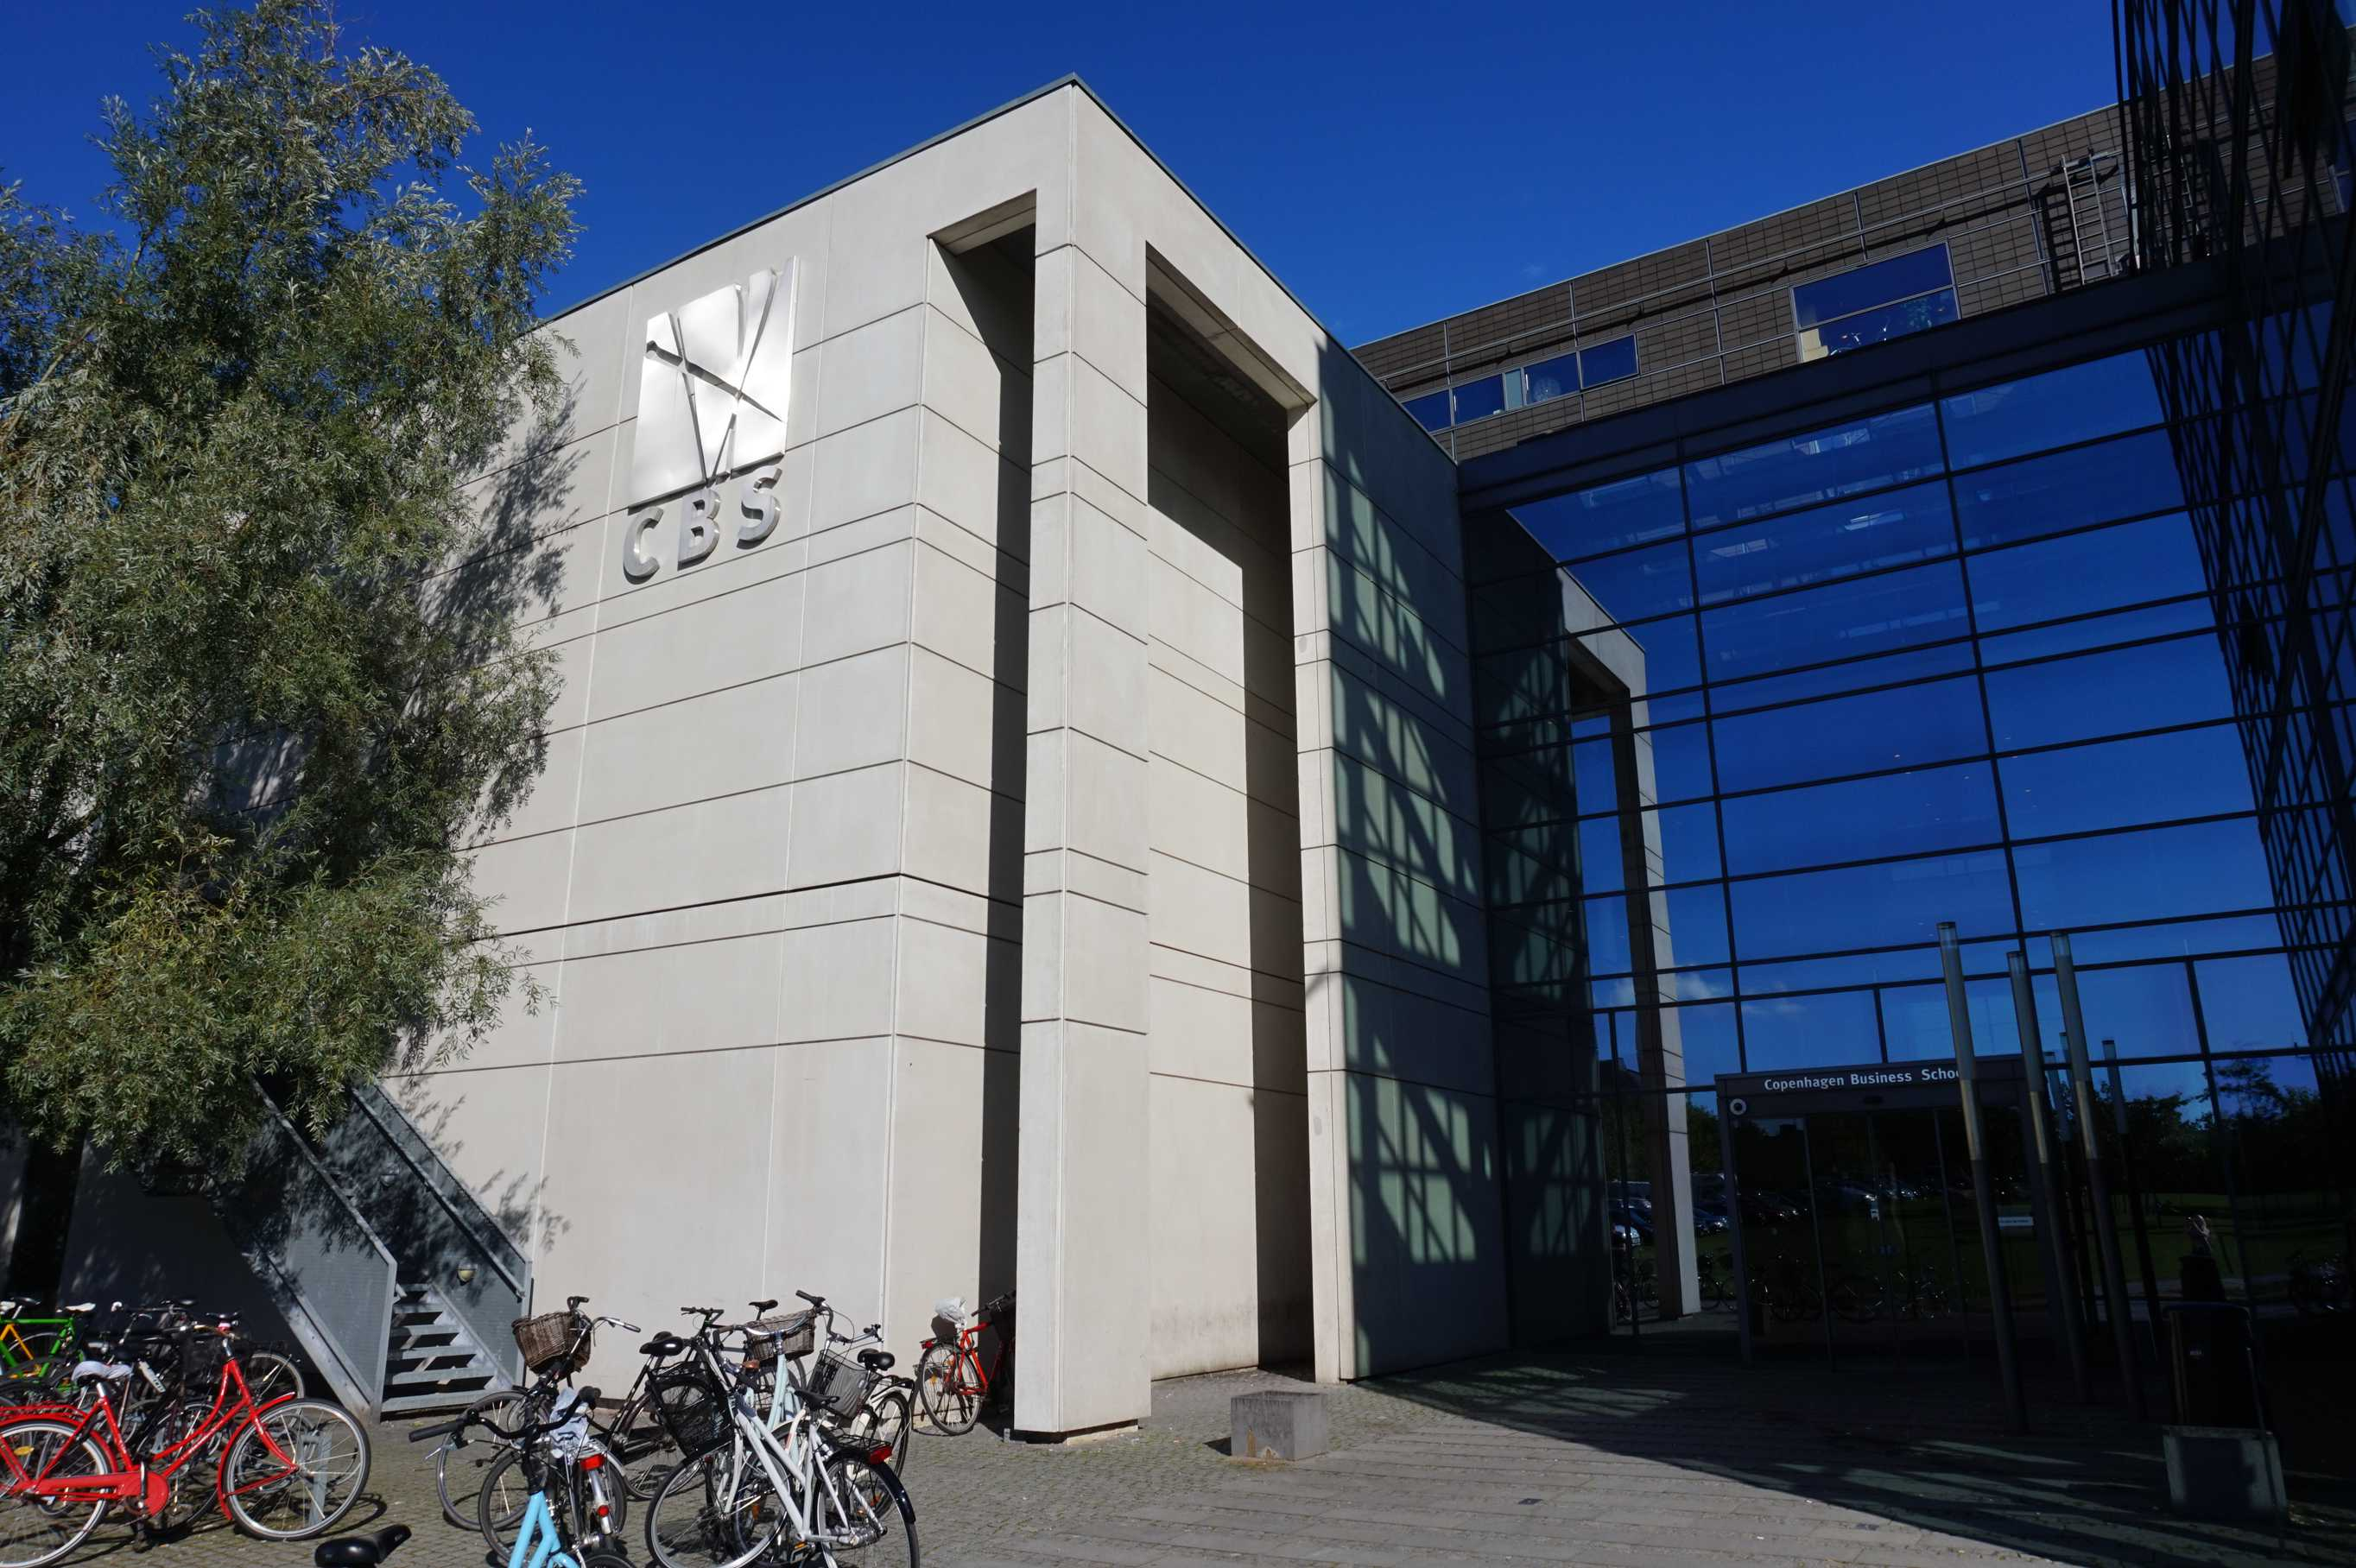 Our host institution - Copenhagen Business School